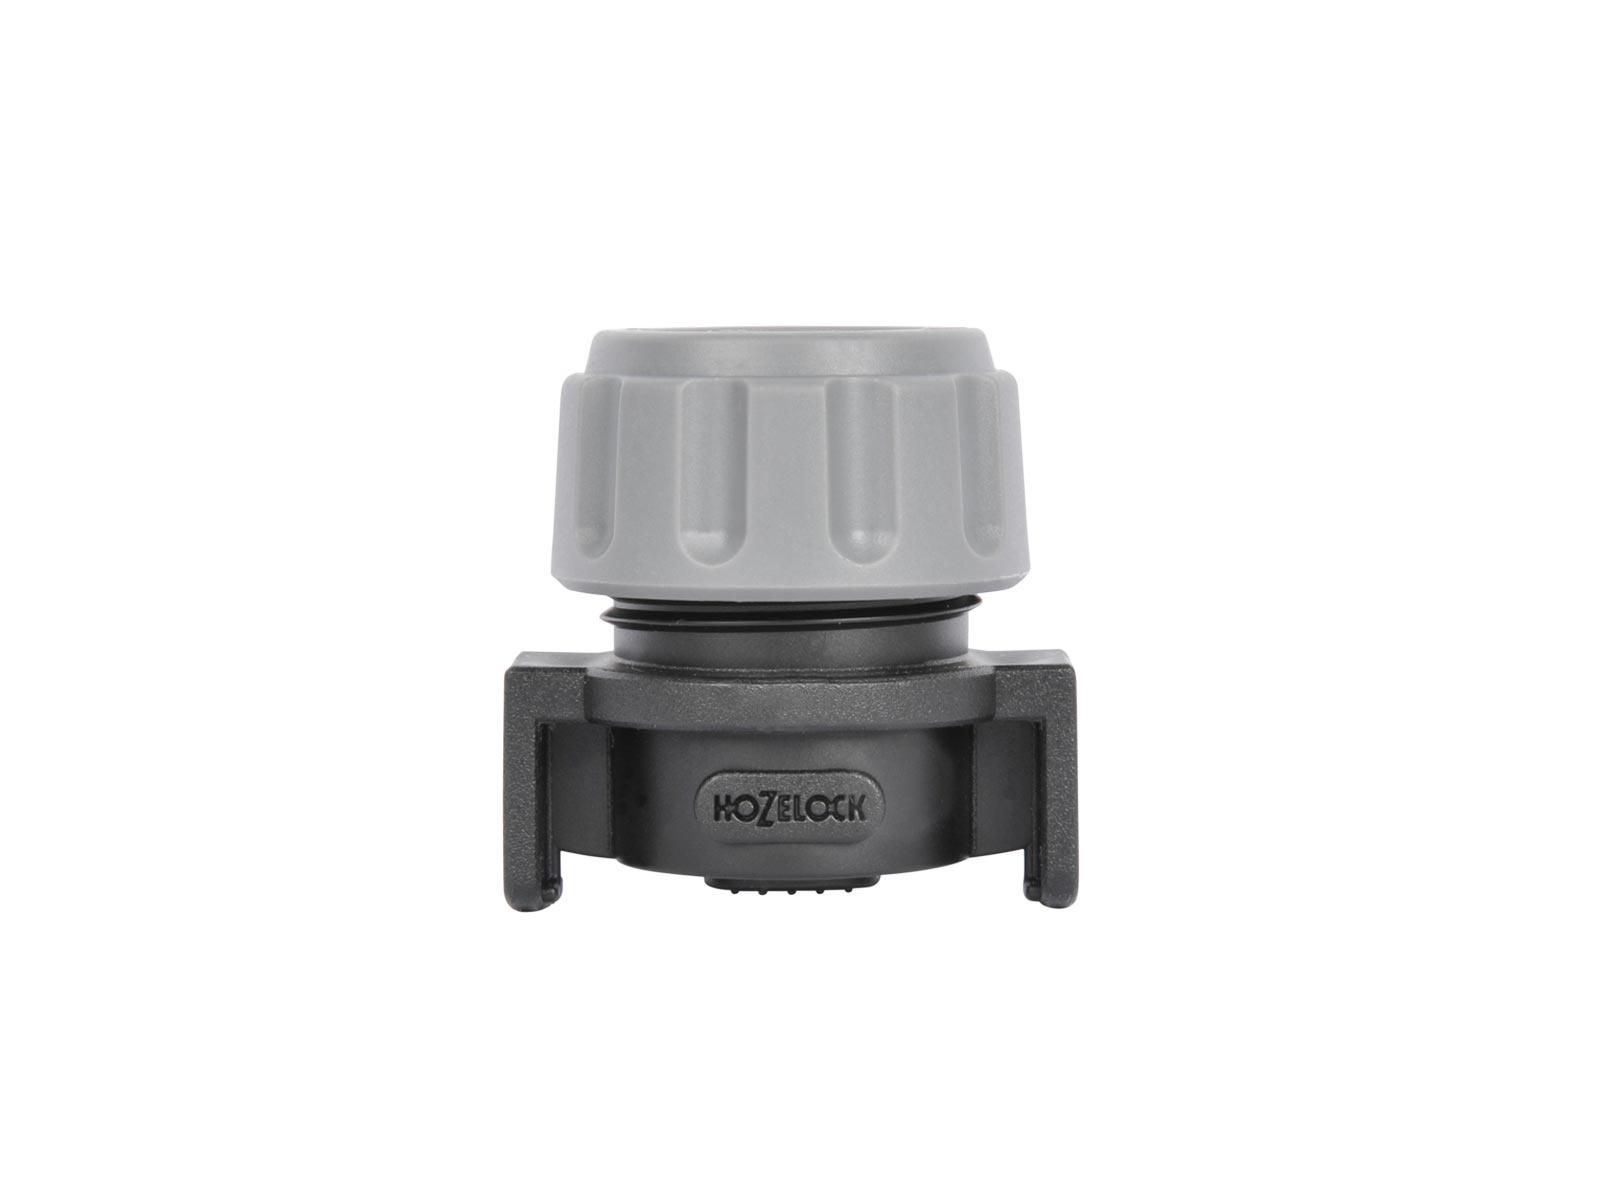 "Система полива Hozelock ""Easy Drip"" 7016 заглушка концевая для автополива, 13 мм, 2 шт., черный, серый"